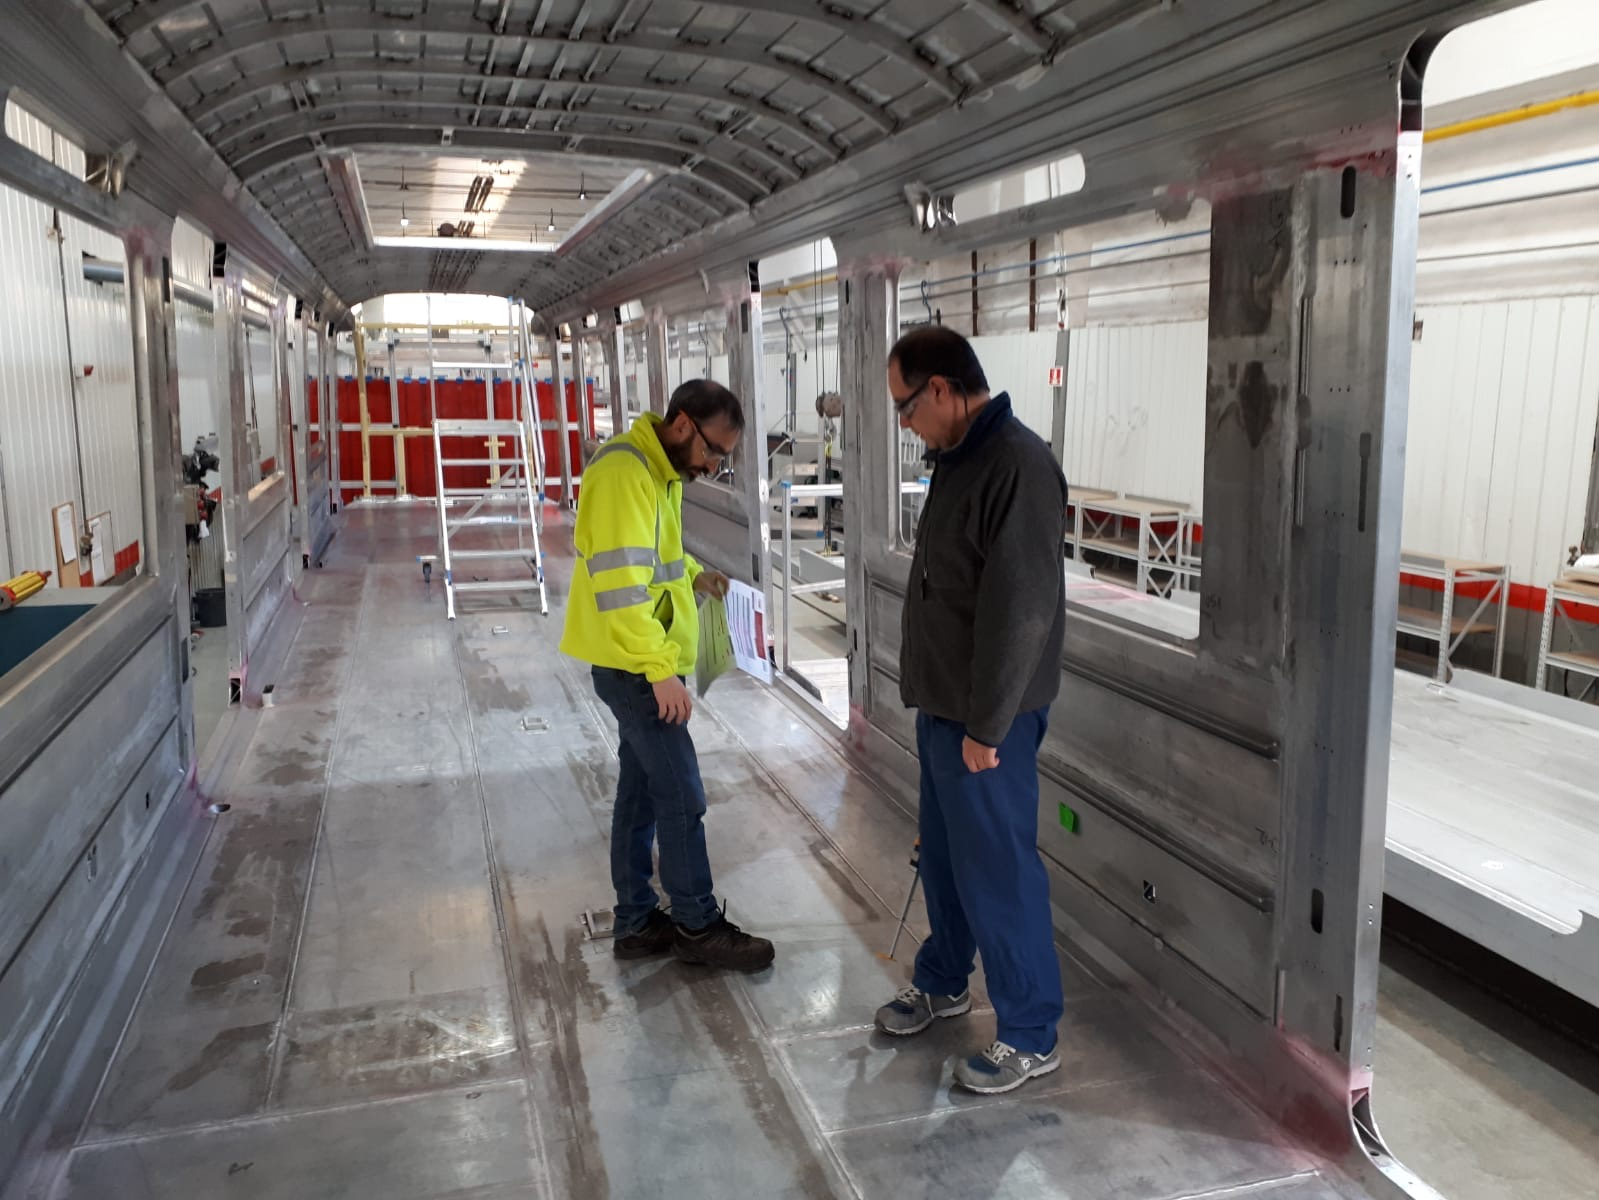 Vloer casco nieuwe M7 metro